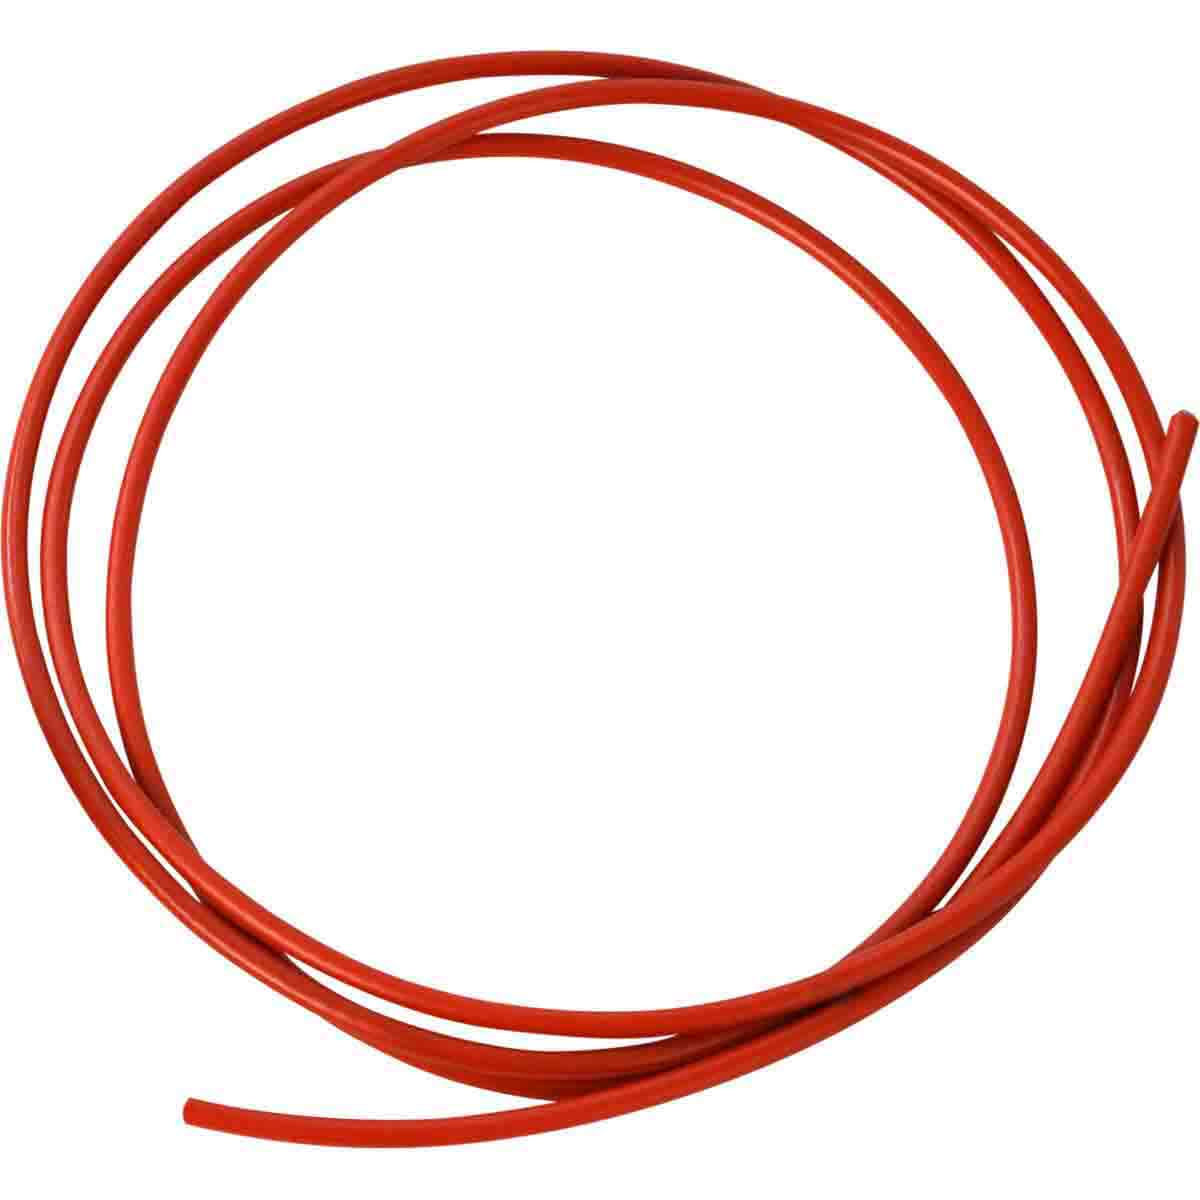 Brady Part: 50947   Sheathed Metal Cable   BradyID.com